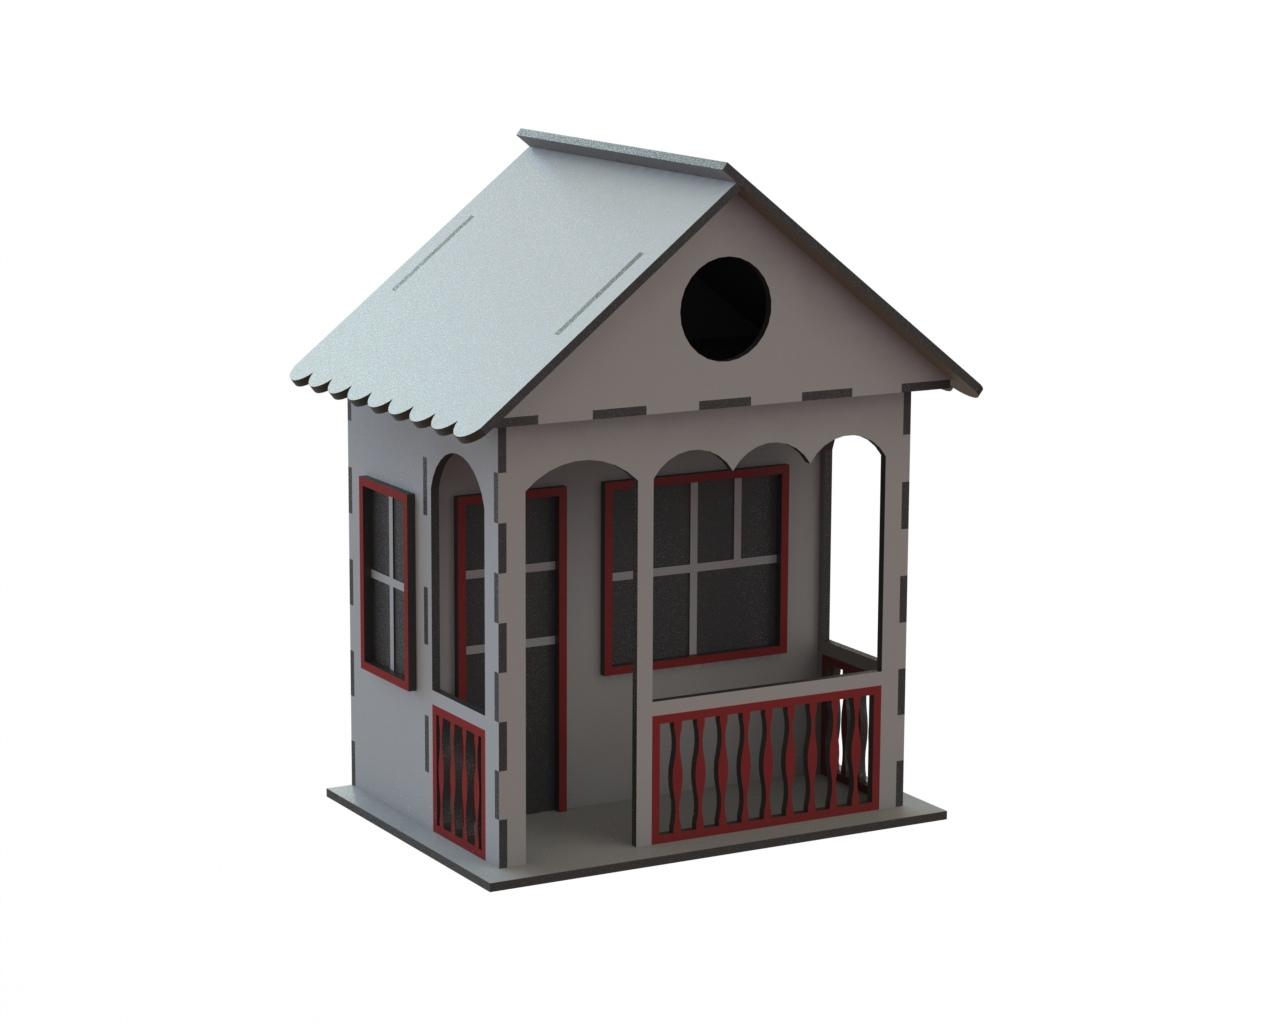 Laser Cut Decorative Wooden Bird House Free CDR Vectors Art